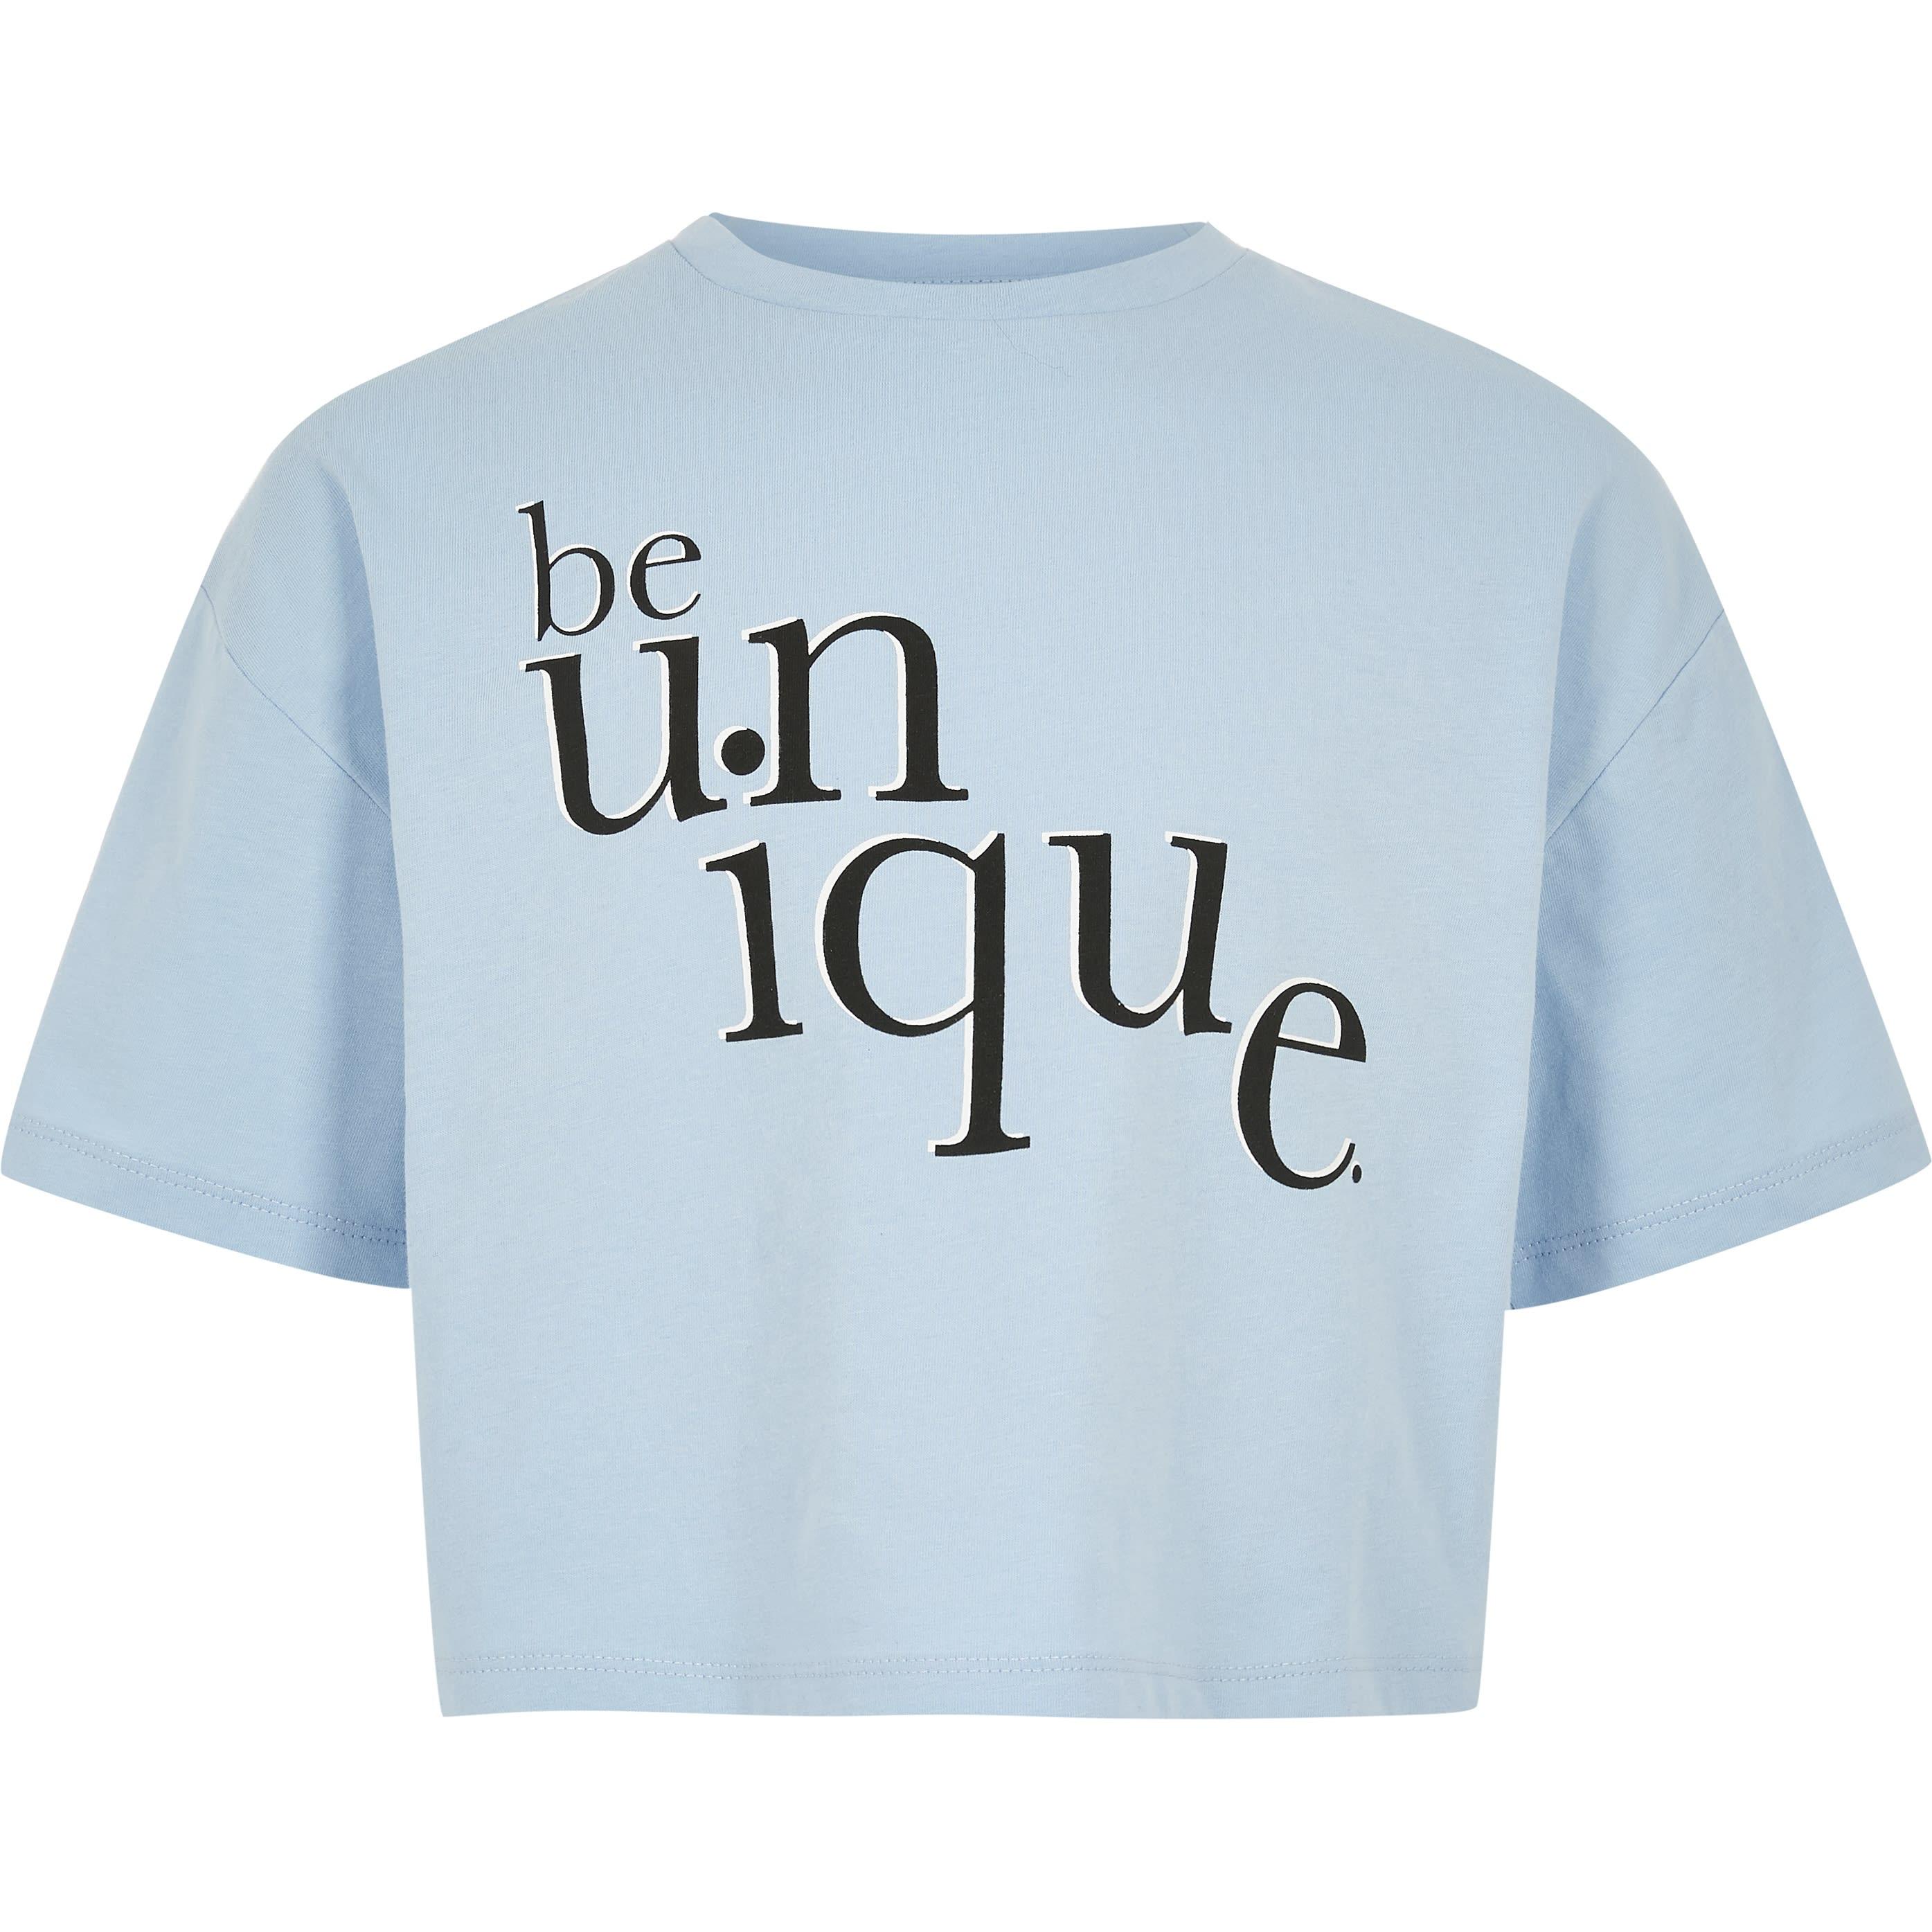 River Island Girls Blue 'Be unique' T-shirt (5-6 Yrs)